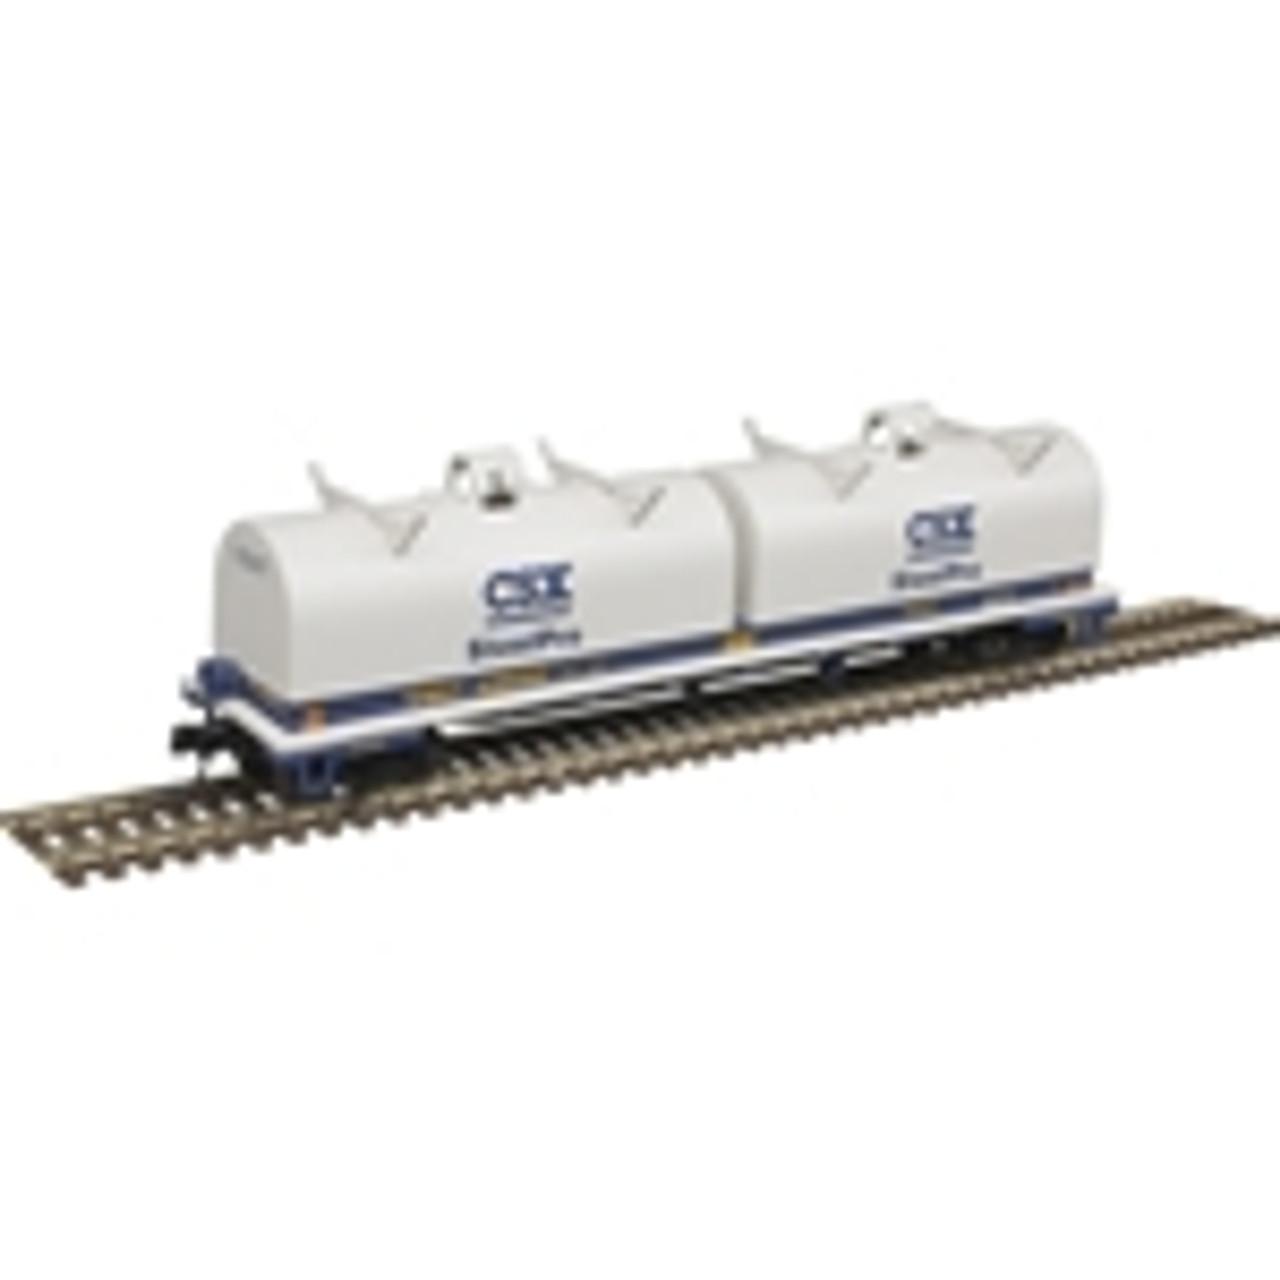 ATLAS 50004652 Cushion Coil Car - CSXT Steel Pro #496016 (SCALE=N) Part # 150-50004652